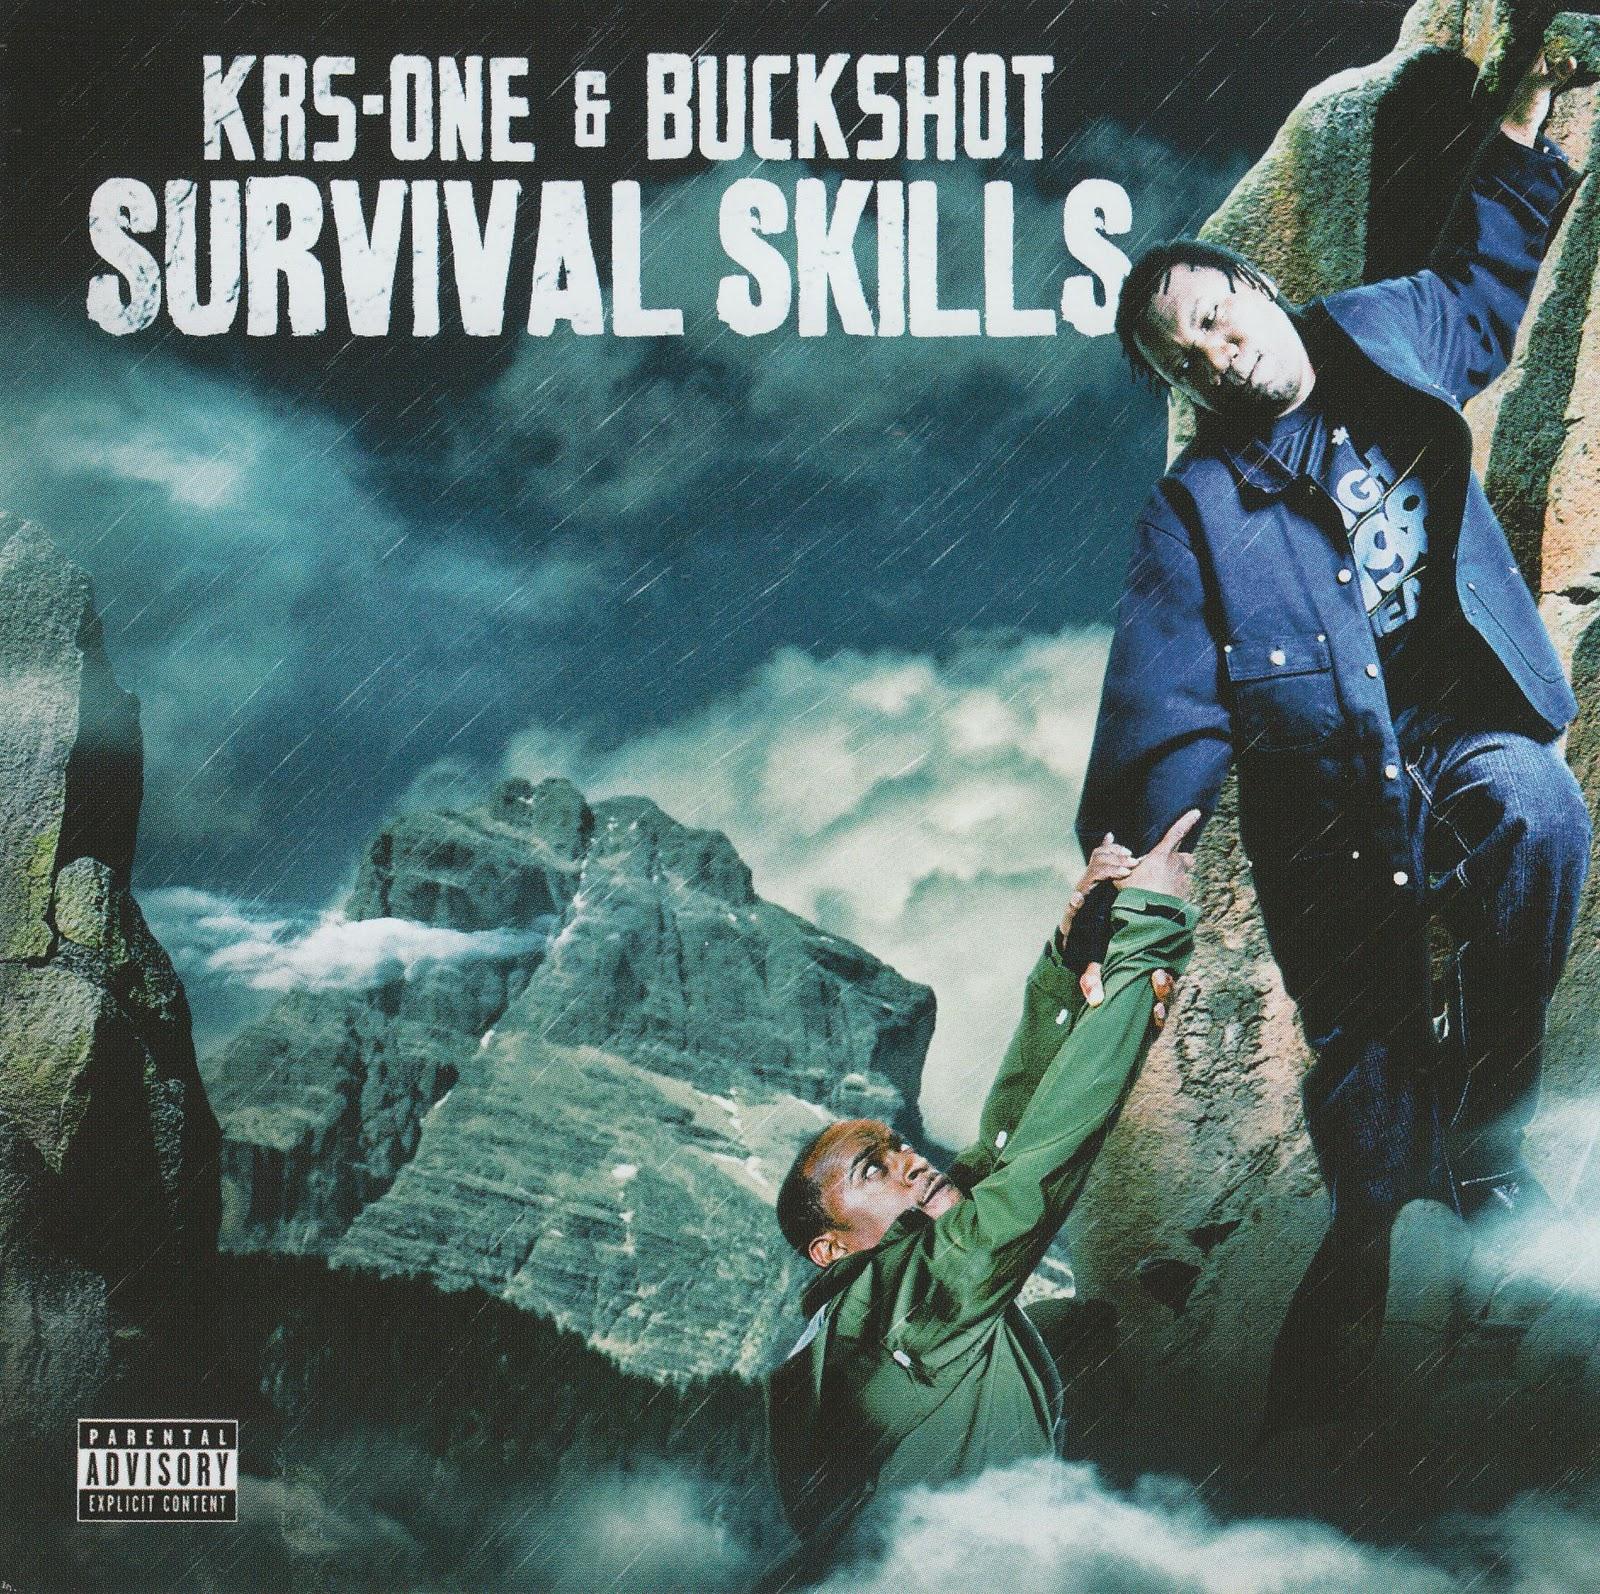 https://lh4.googleusercontent.com/-u3zgh_BrEp0/TYMy6vfqgbI/AAAAAAAABJE/mJCnLQOrwiI/s1600/00-krs-one_and_buckshot-survival_skills-2009-ad-1.jpg